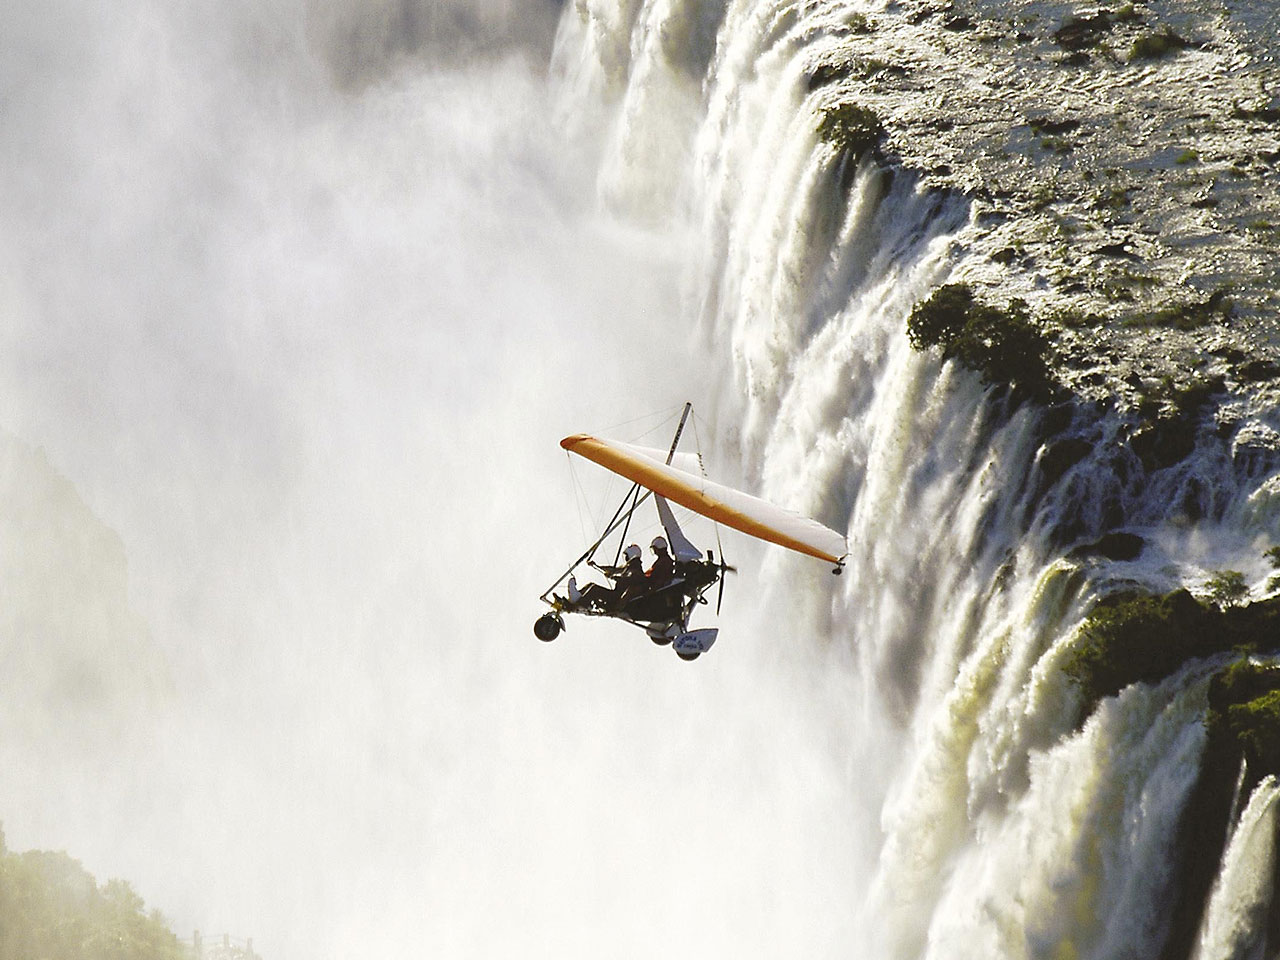 A microlight safari over the white water and spray of Victoria Falls.